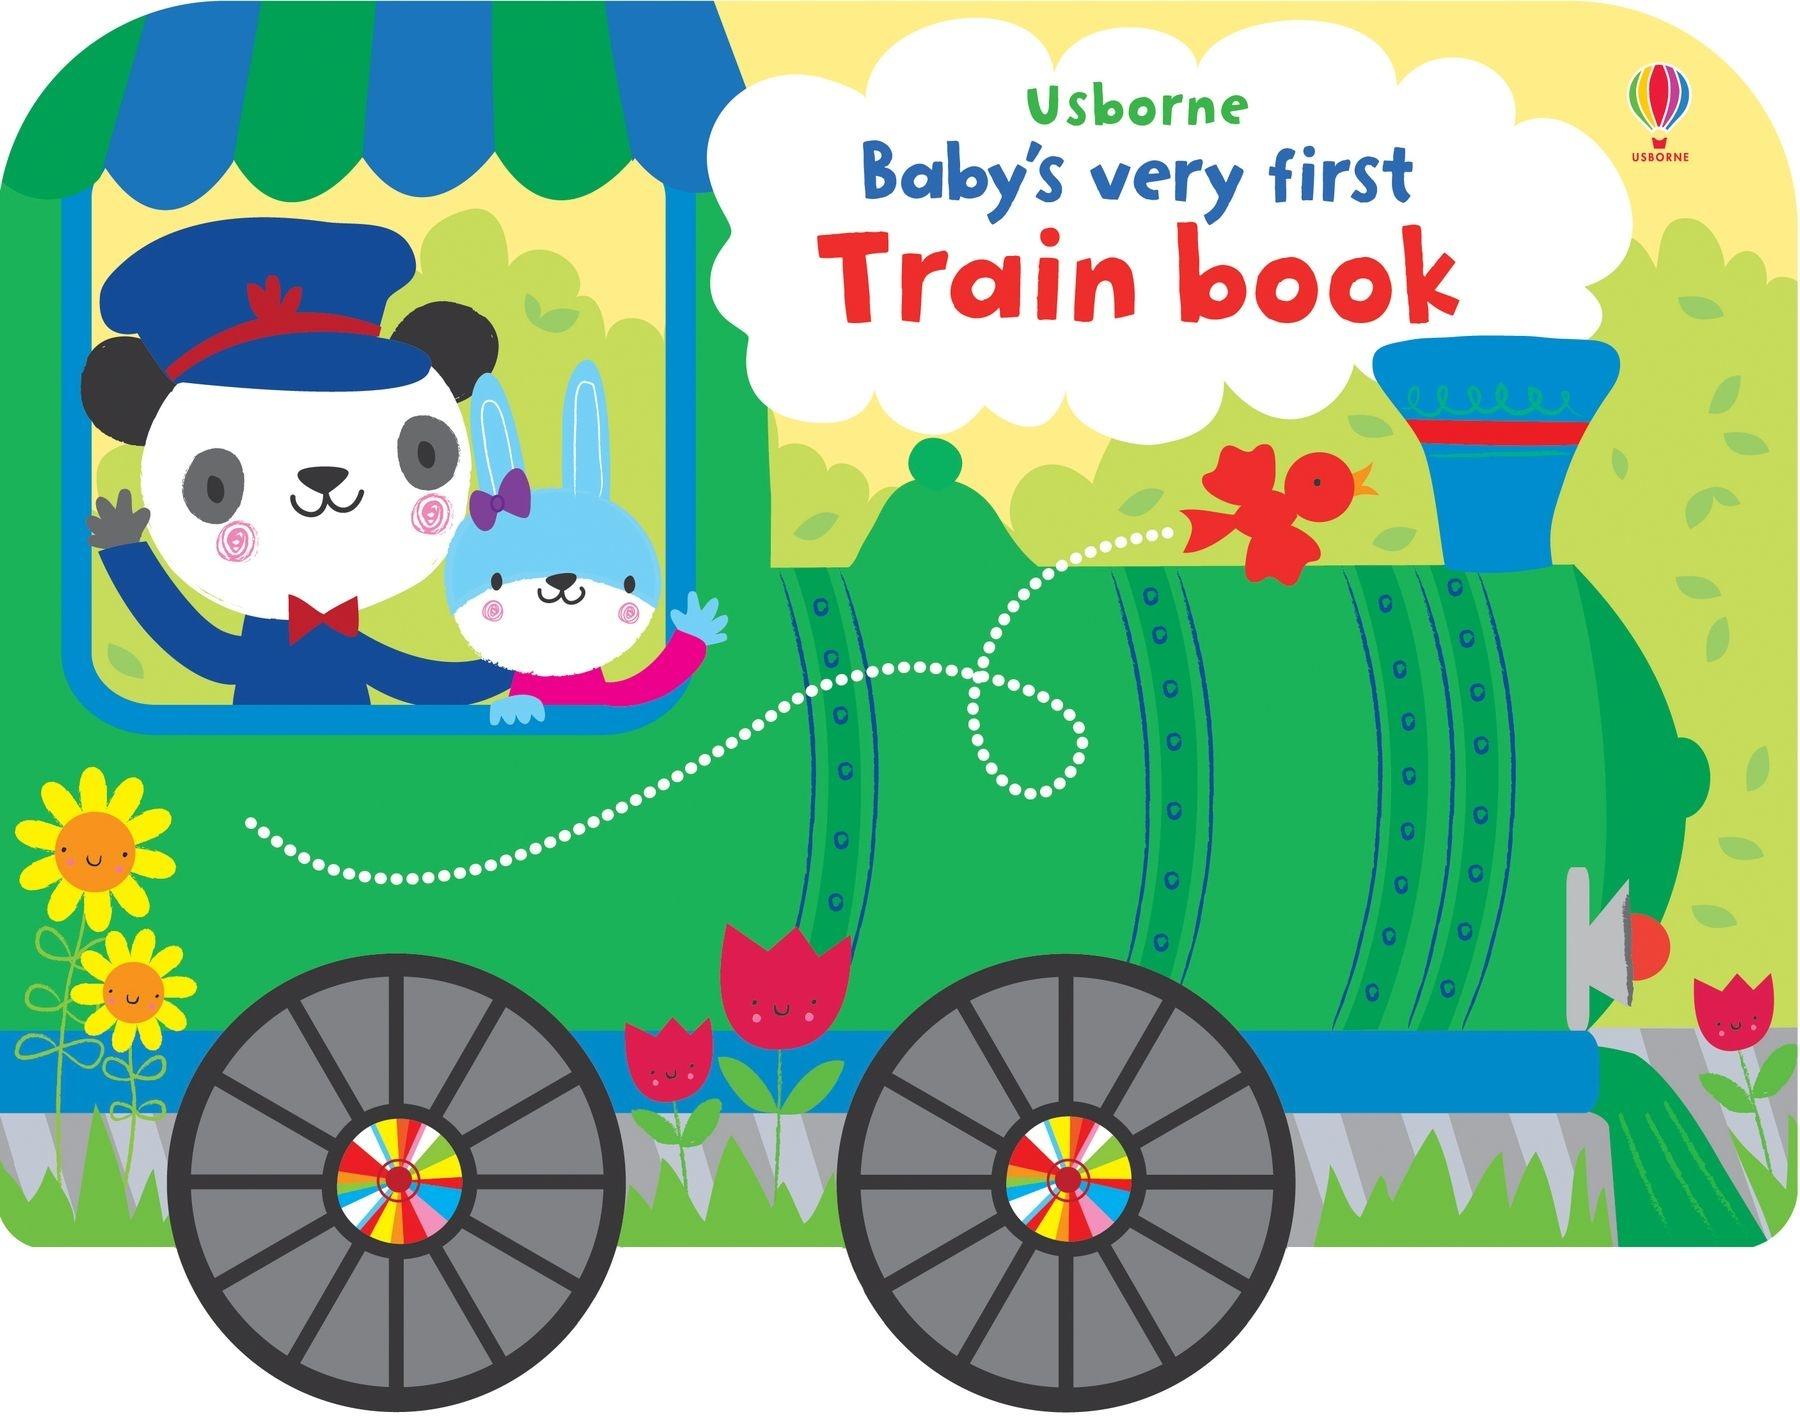 EDC/Usborne Baby's Very First Train Book